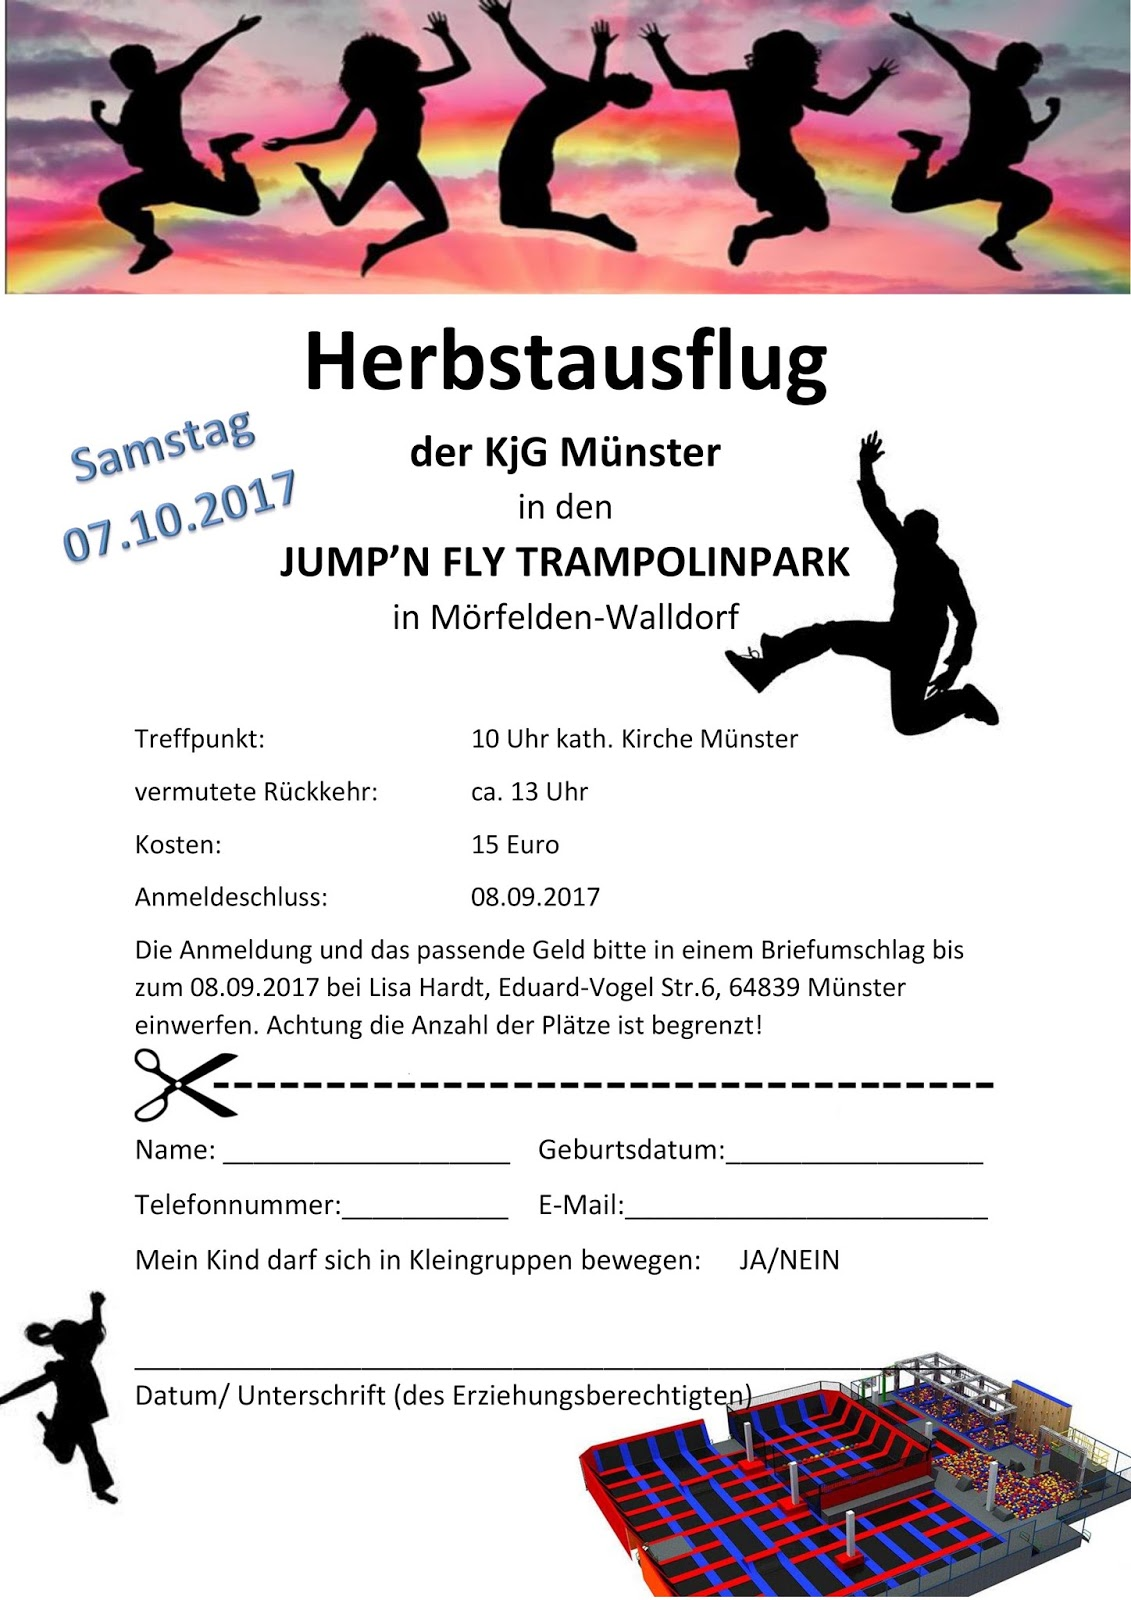 KjG Münster